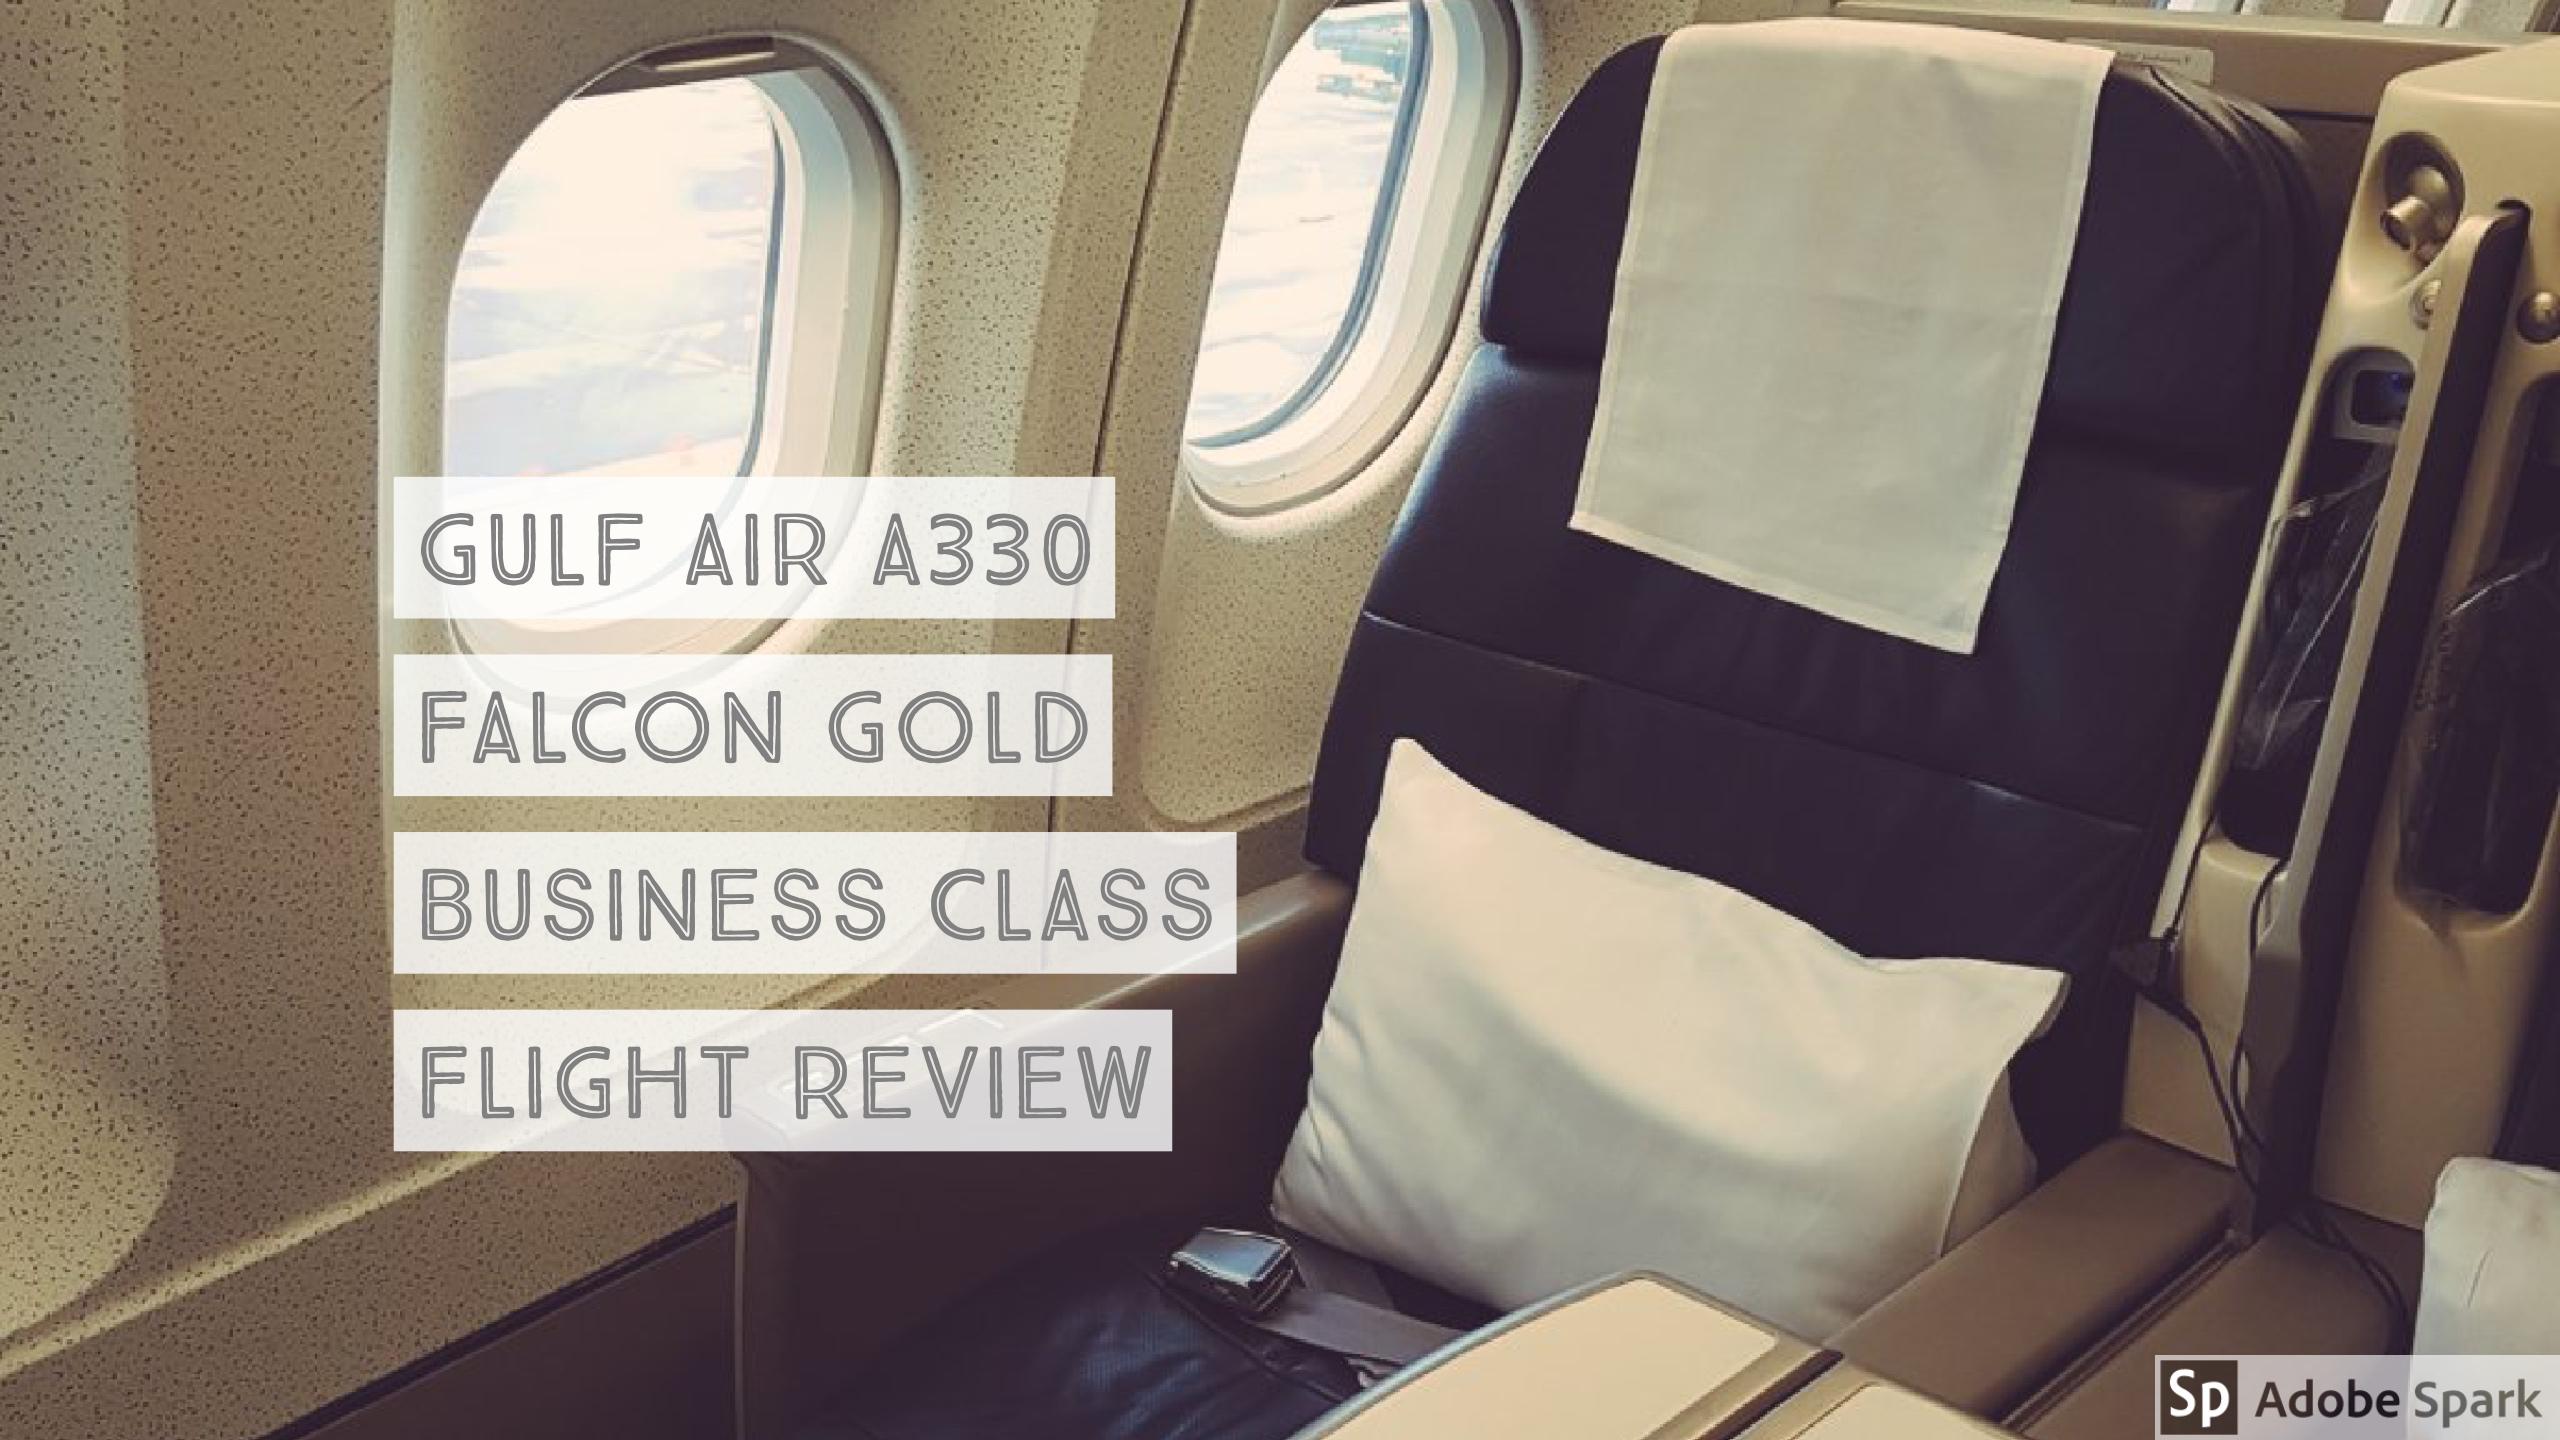 Gulf Air A330 London Heathrow To Bahrain Falcon Gold Business Class Flight Review Eat Sleep Shoot Travel